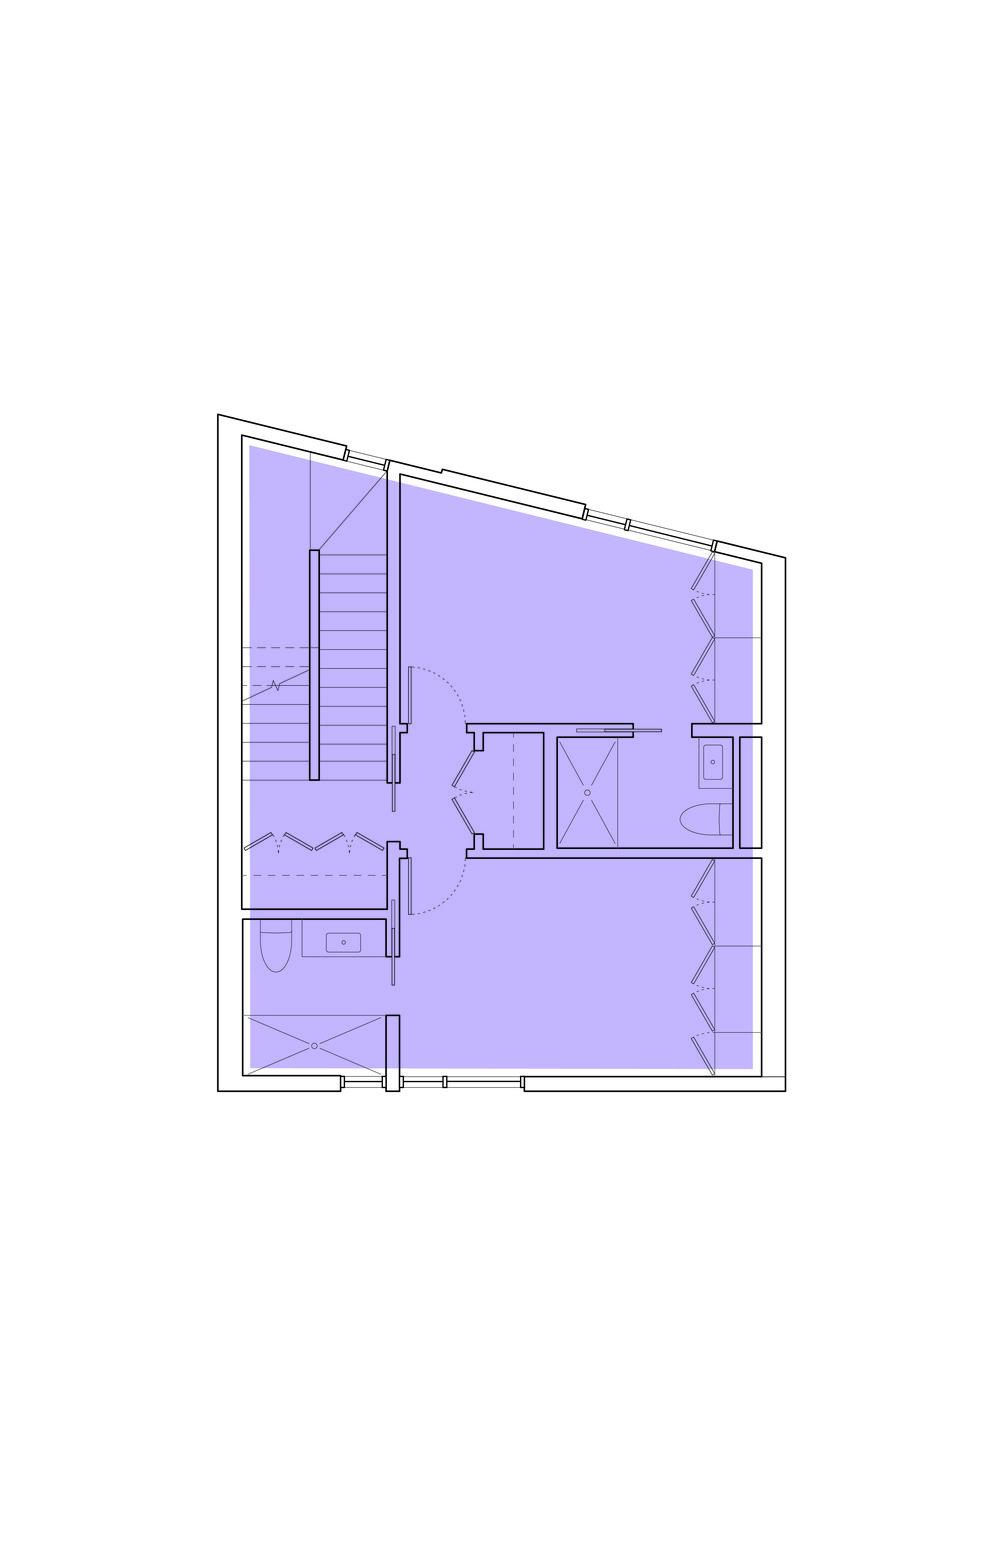 3 THIRD FLOOR - Units.jpg